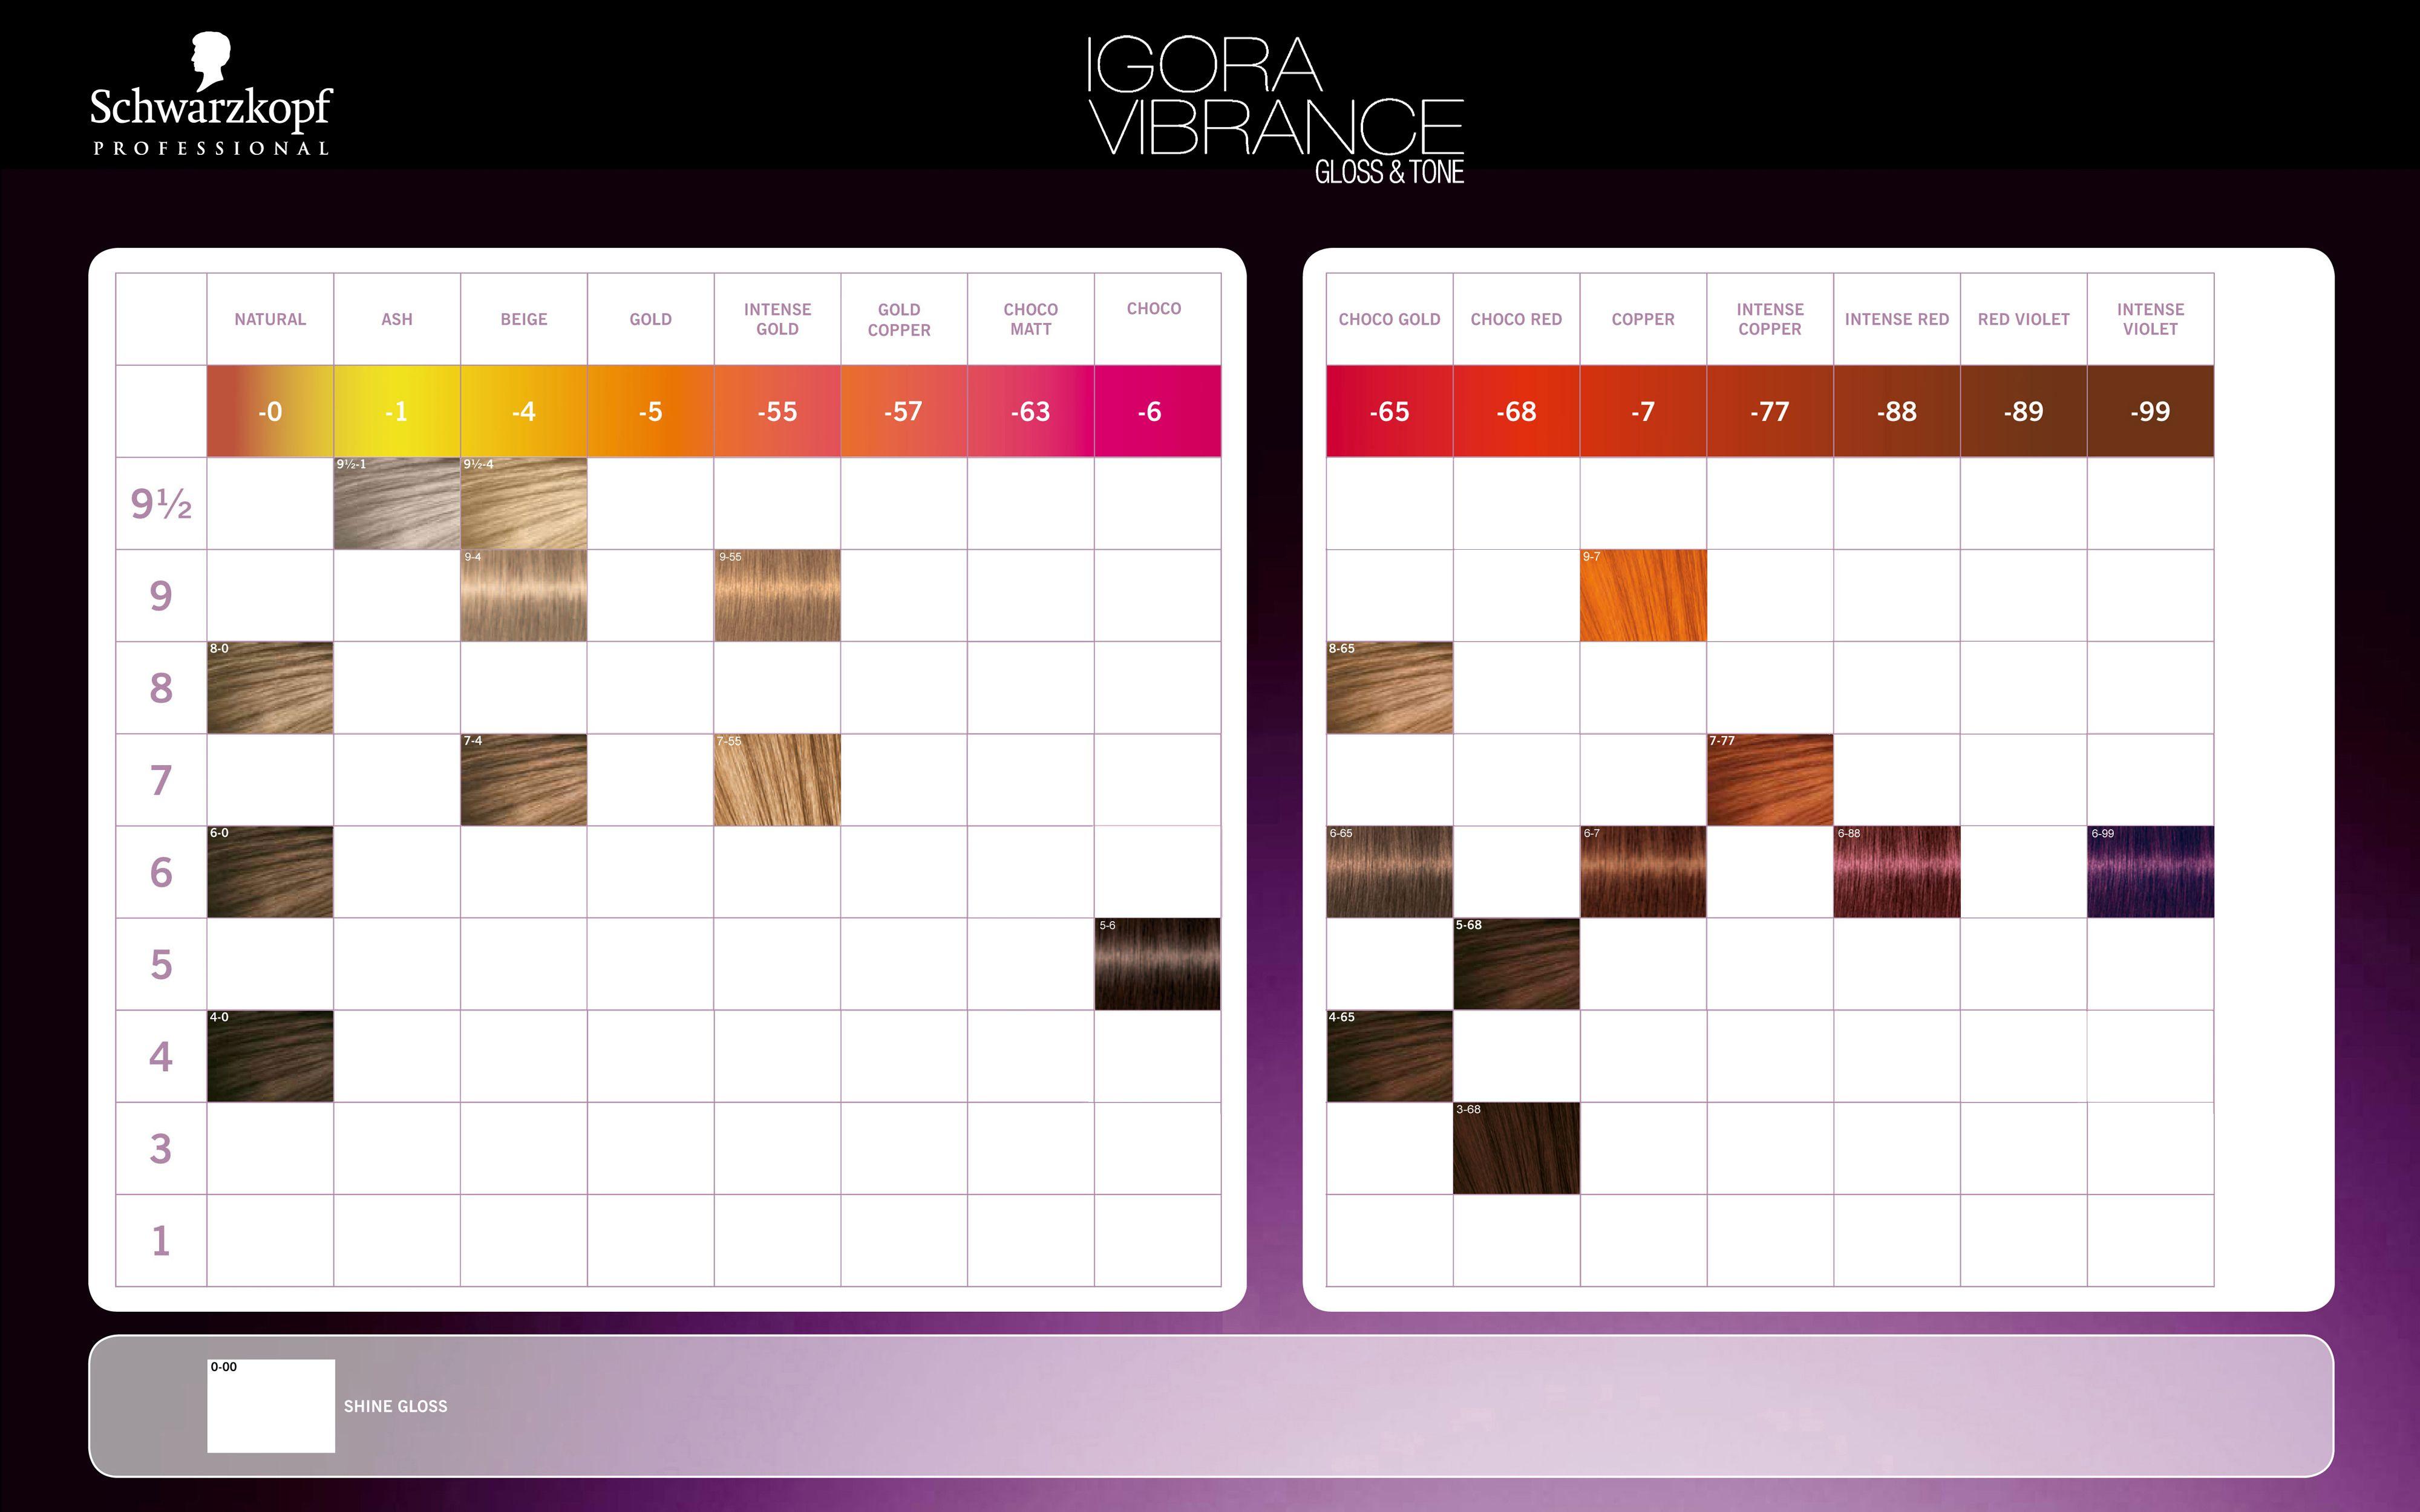 Schwarzkopf Professional Igora Vibrance Gloss Tone Color Chart 2014 Schwarzkopf Hair Color Hair Color Chart Schwarzkopf Hair